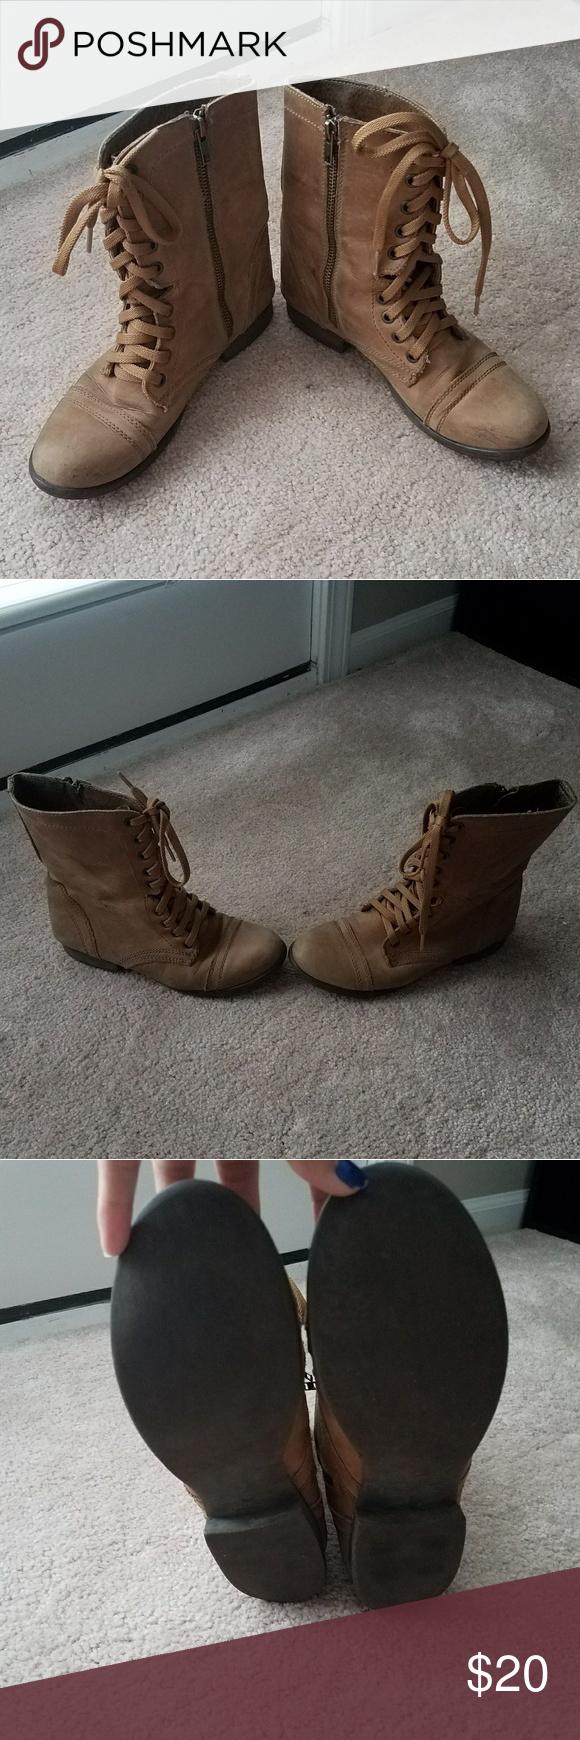 How to combat zip up wear boots